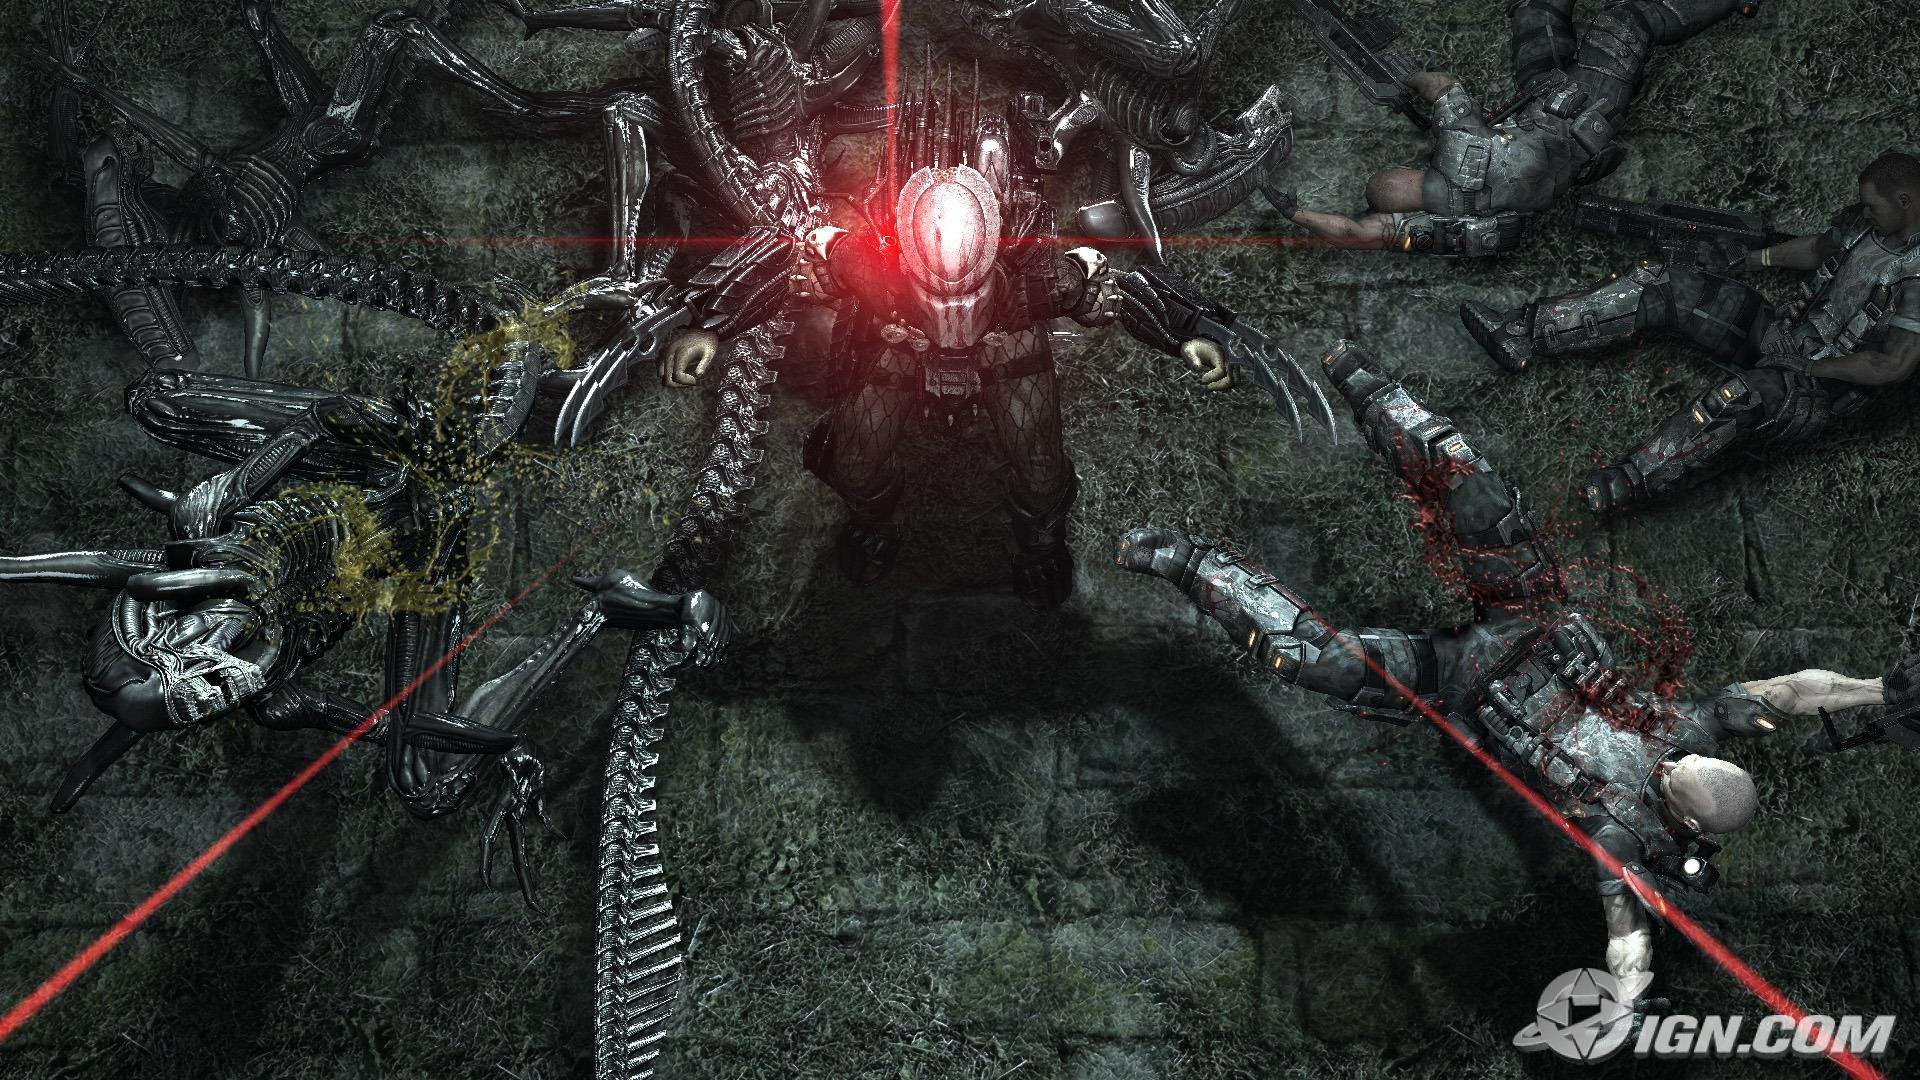 Alien Vs Predator Free Wallpaper Wallpaperjam Com